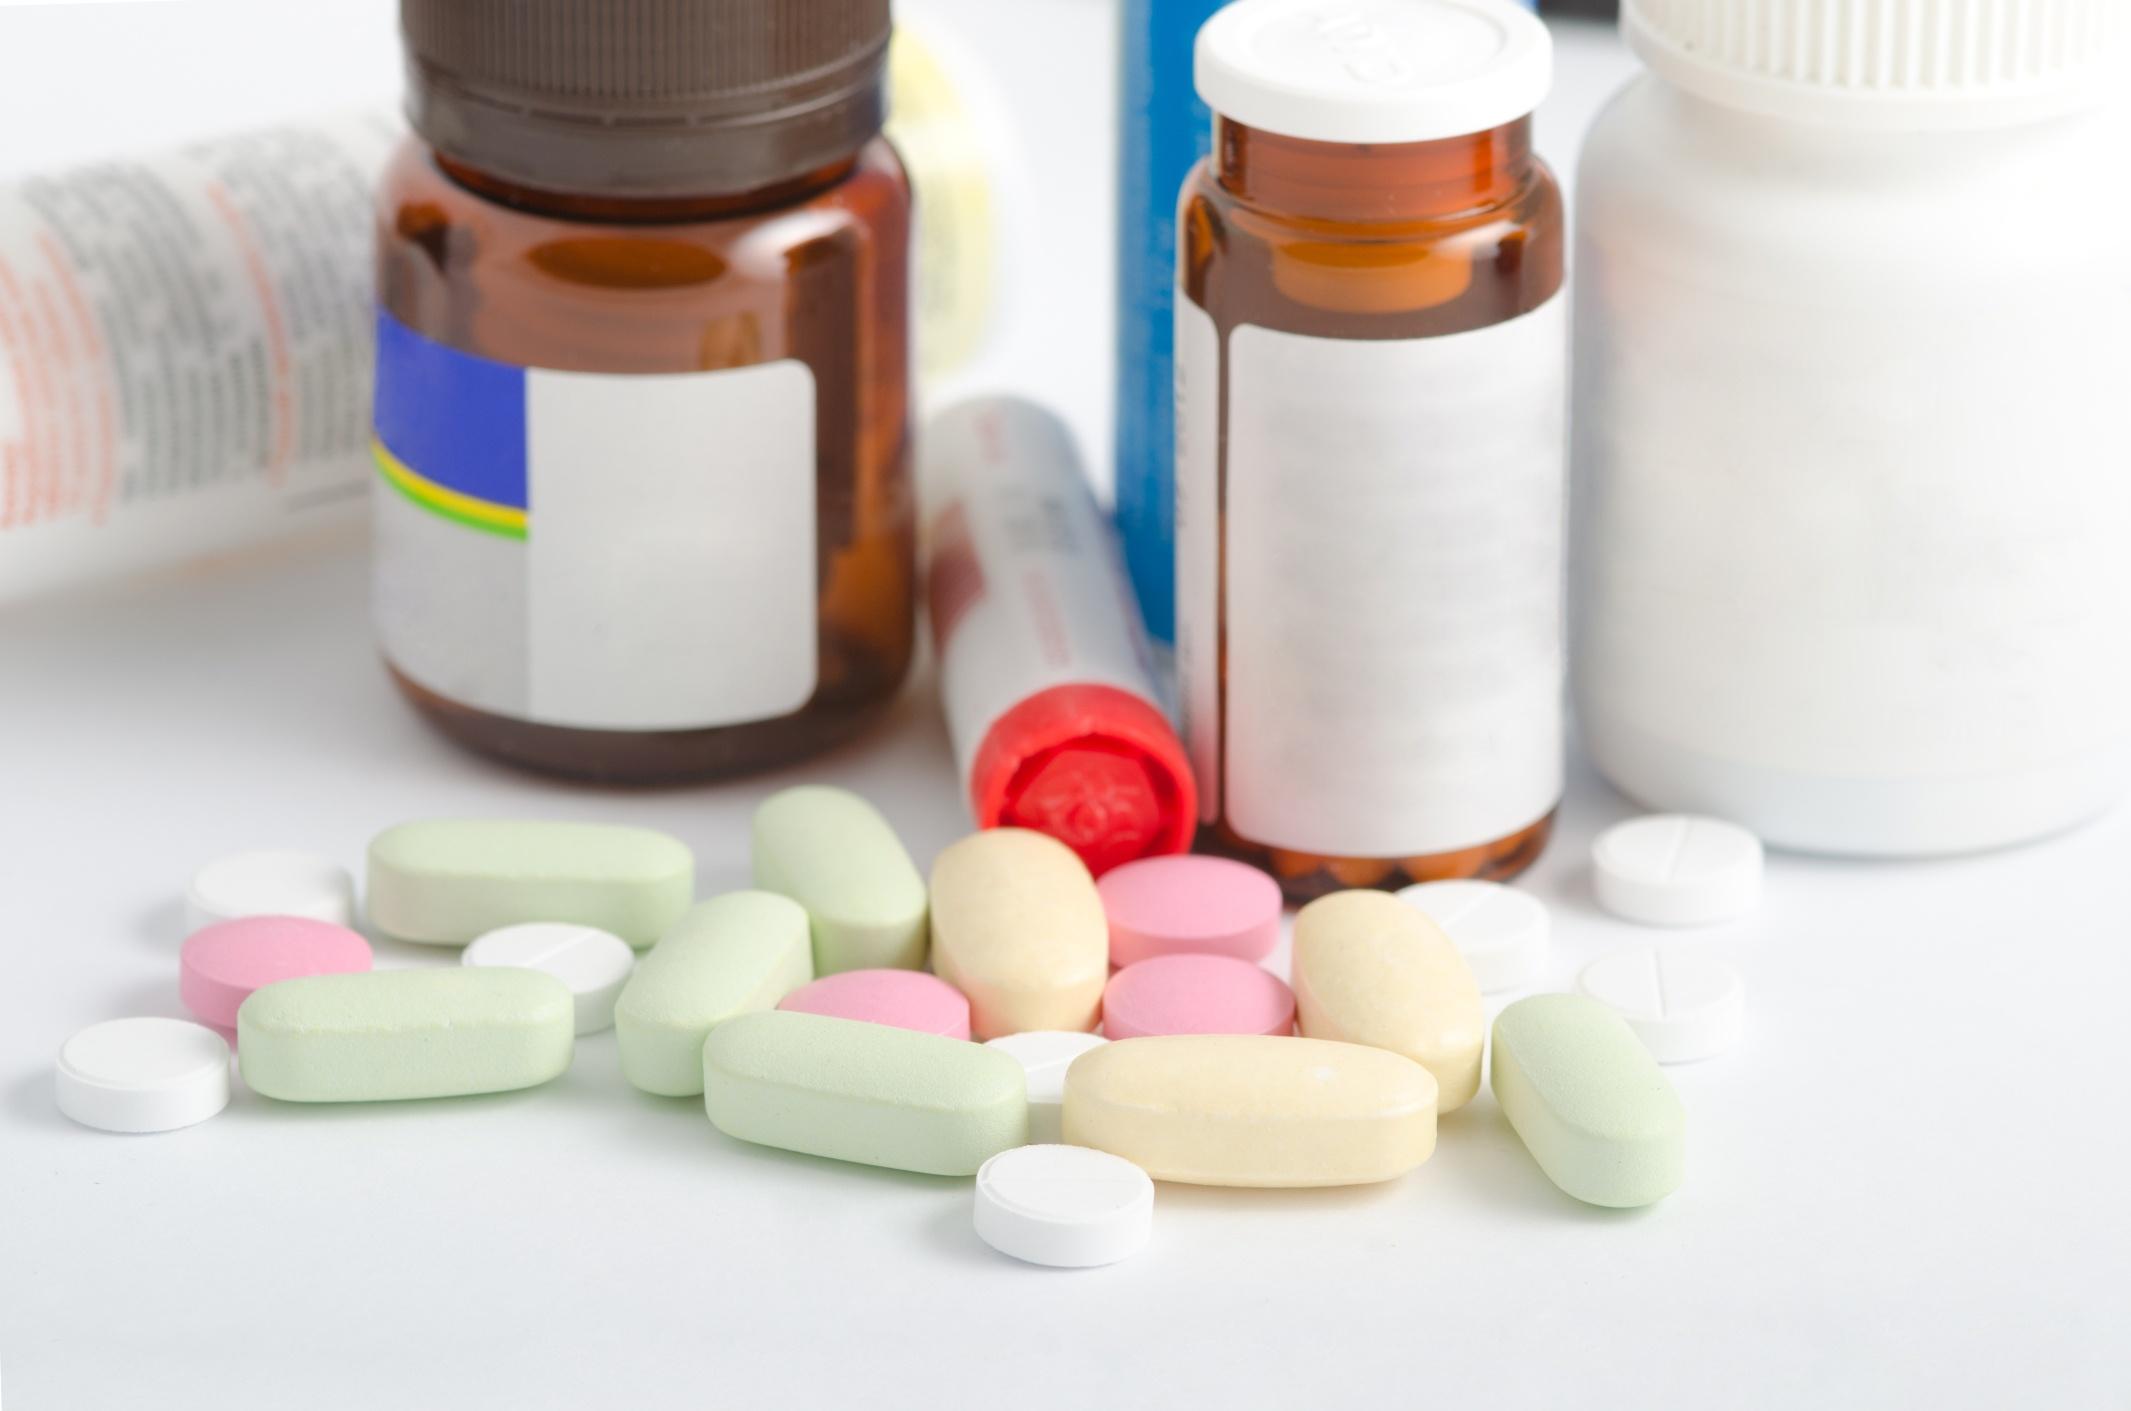 Health Reform & Healthcare Legislation Updates You Should Know